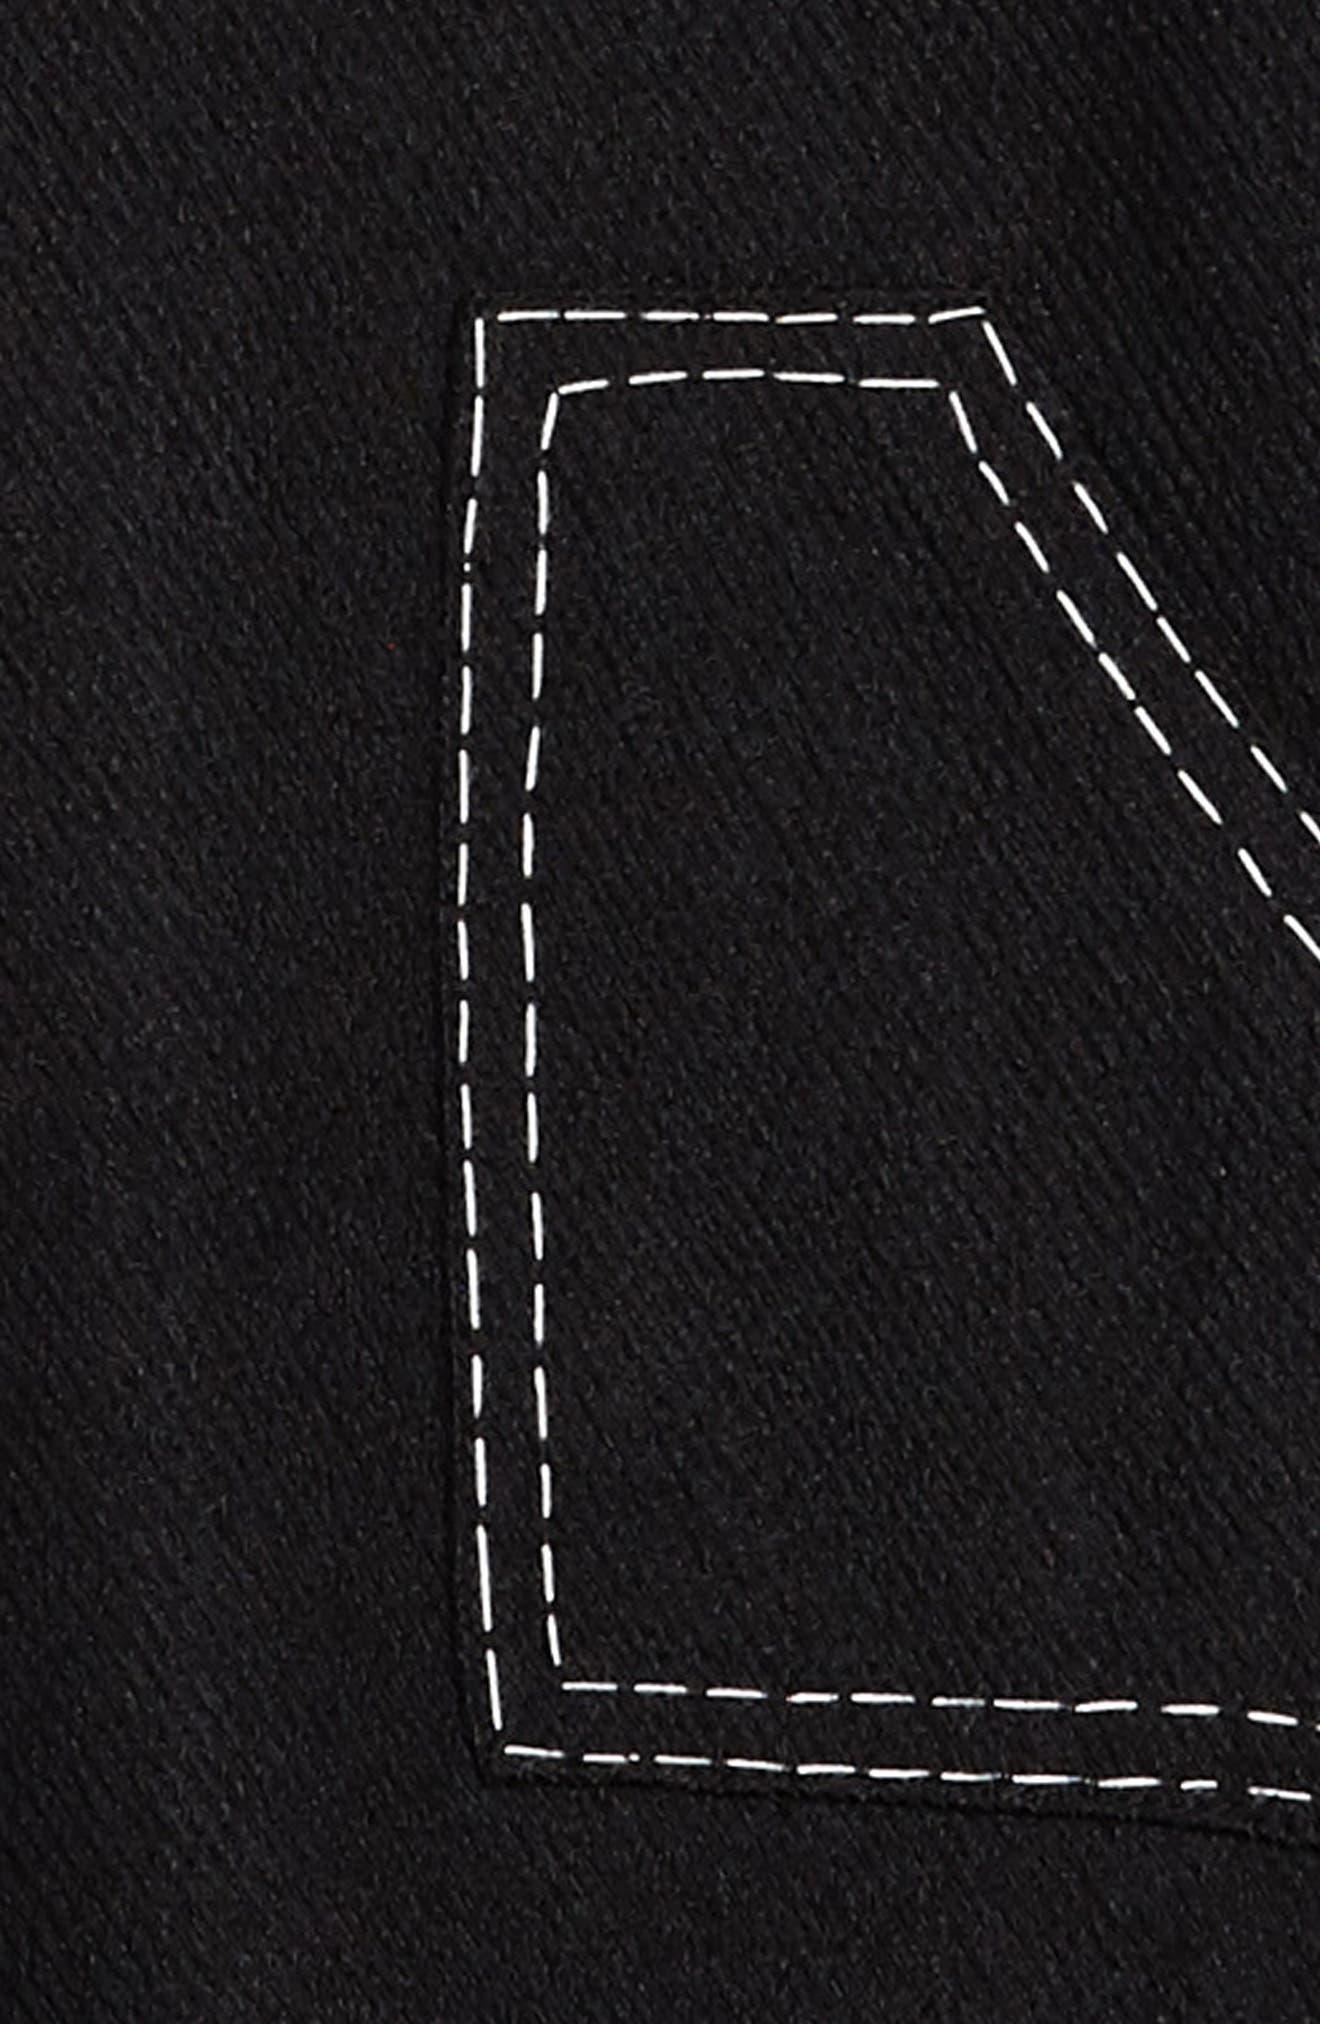 Mod Sleeveless Shift Dress,                             Alternate thumbnail 3, color,                             001